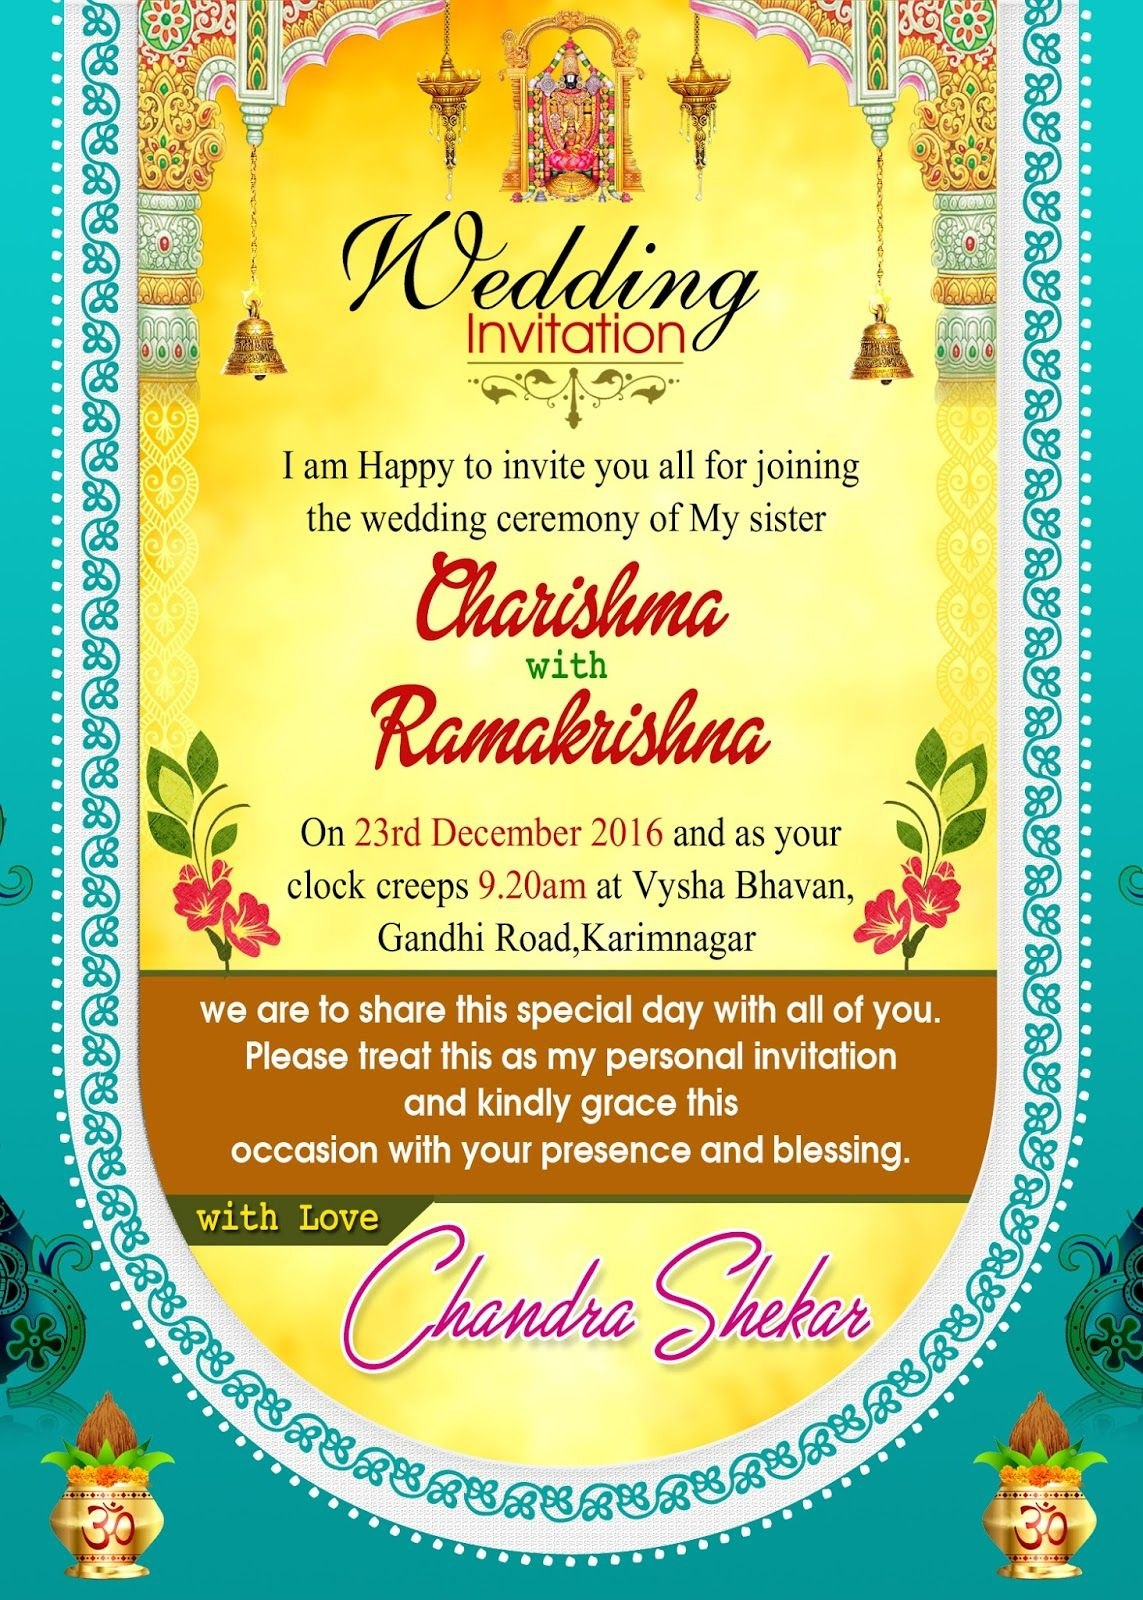 Pinkakuli Mishra On Indian Wedding Invitations  Hindu Wedding With Regard To Indian Wedding Cards Design Templates